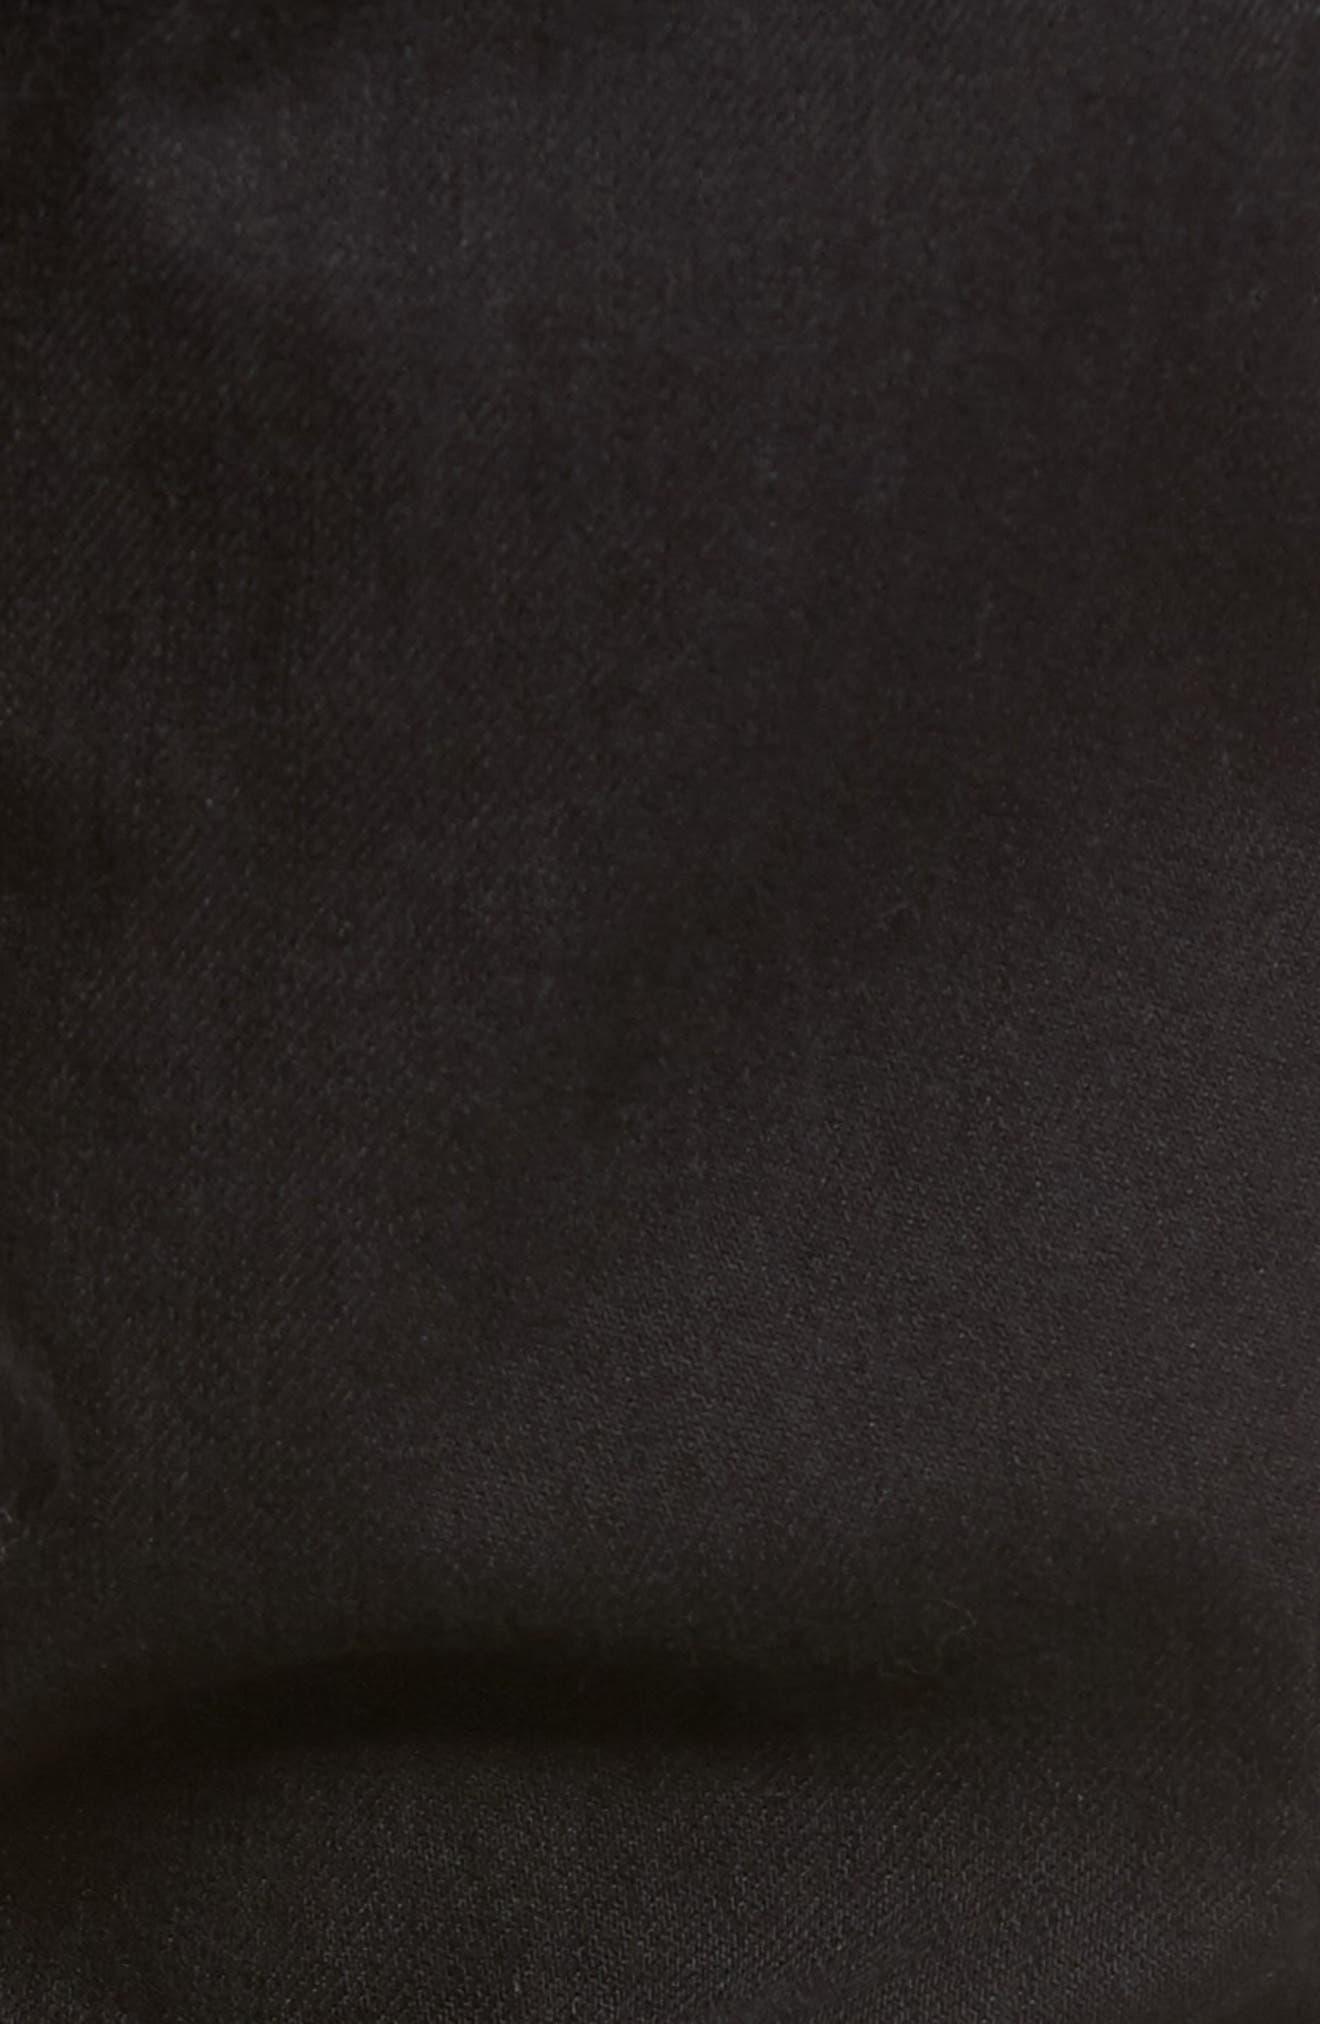 Thavar Skinny Fit Jeans,                             Alternate thumbnail 5, color,                             008